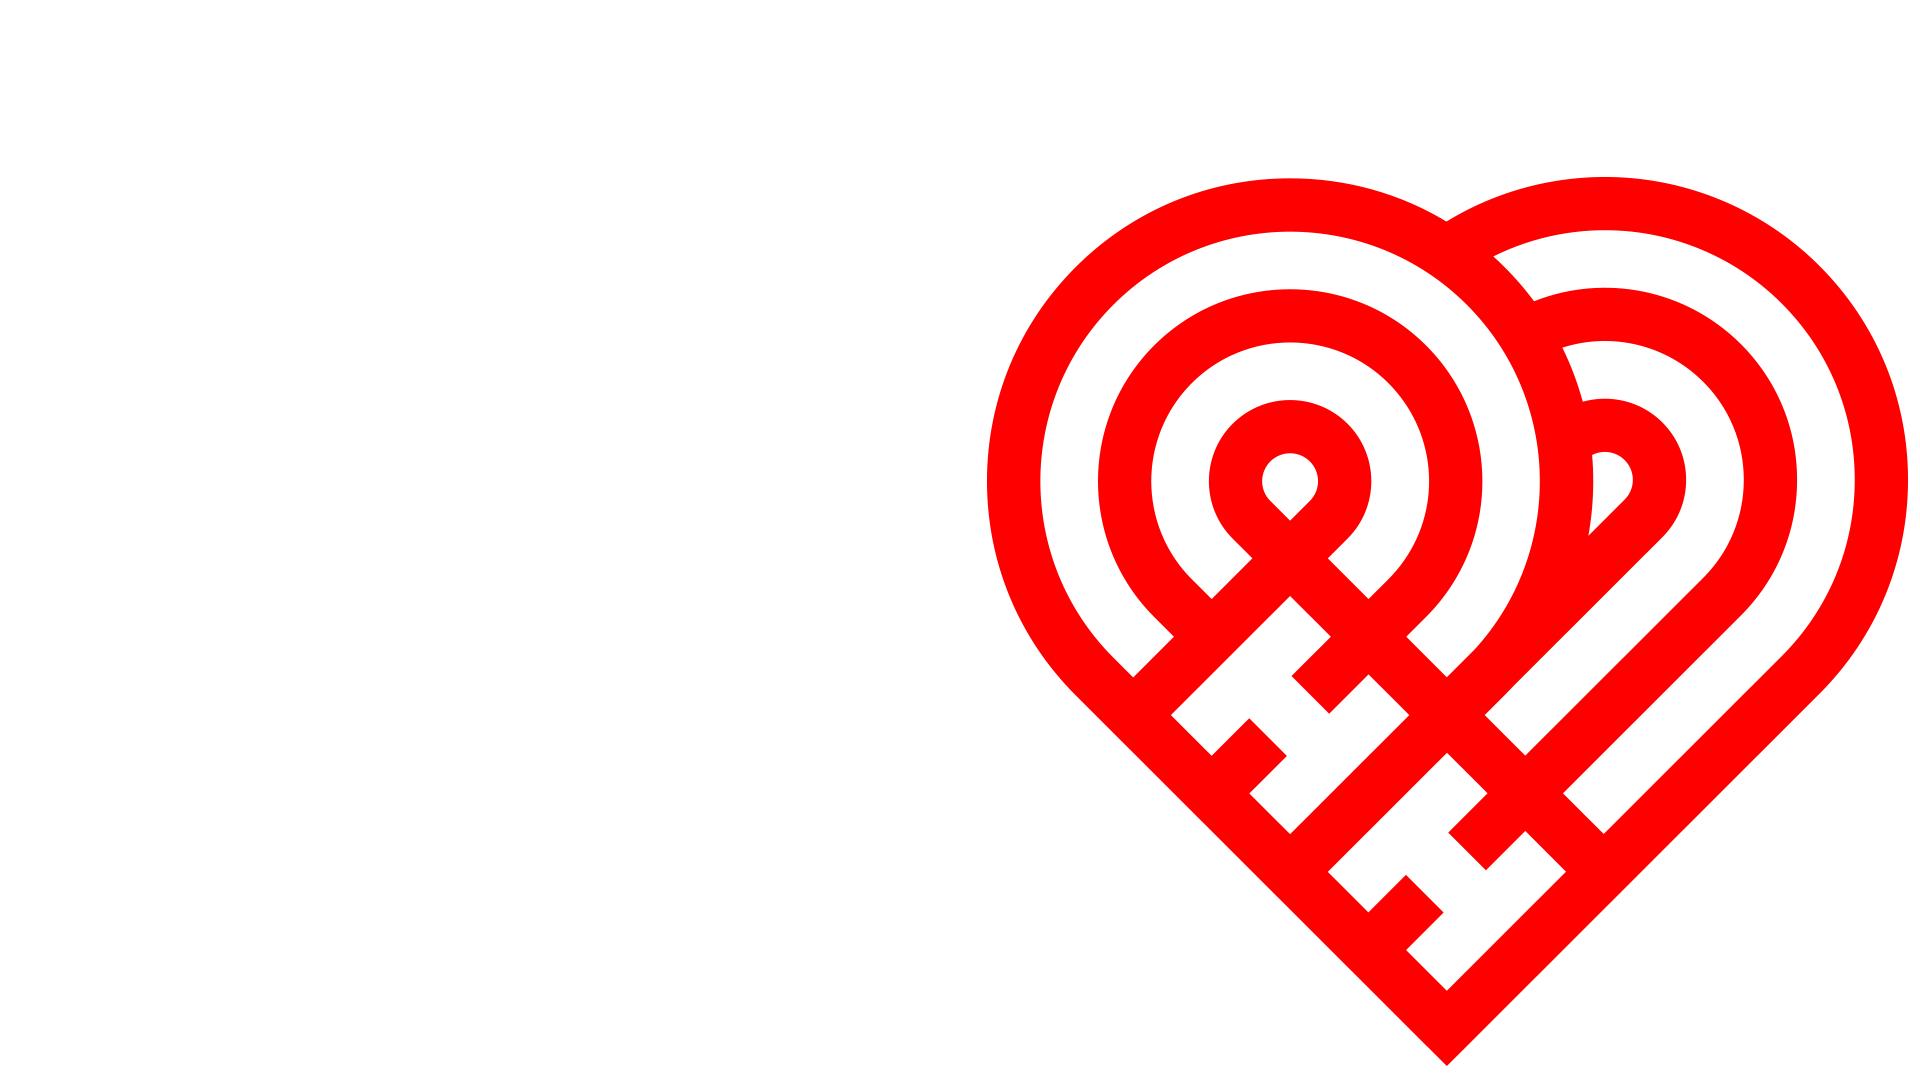 HELLO HEARTBEAT